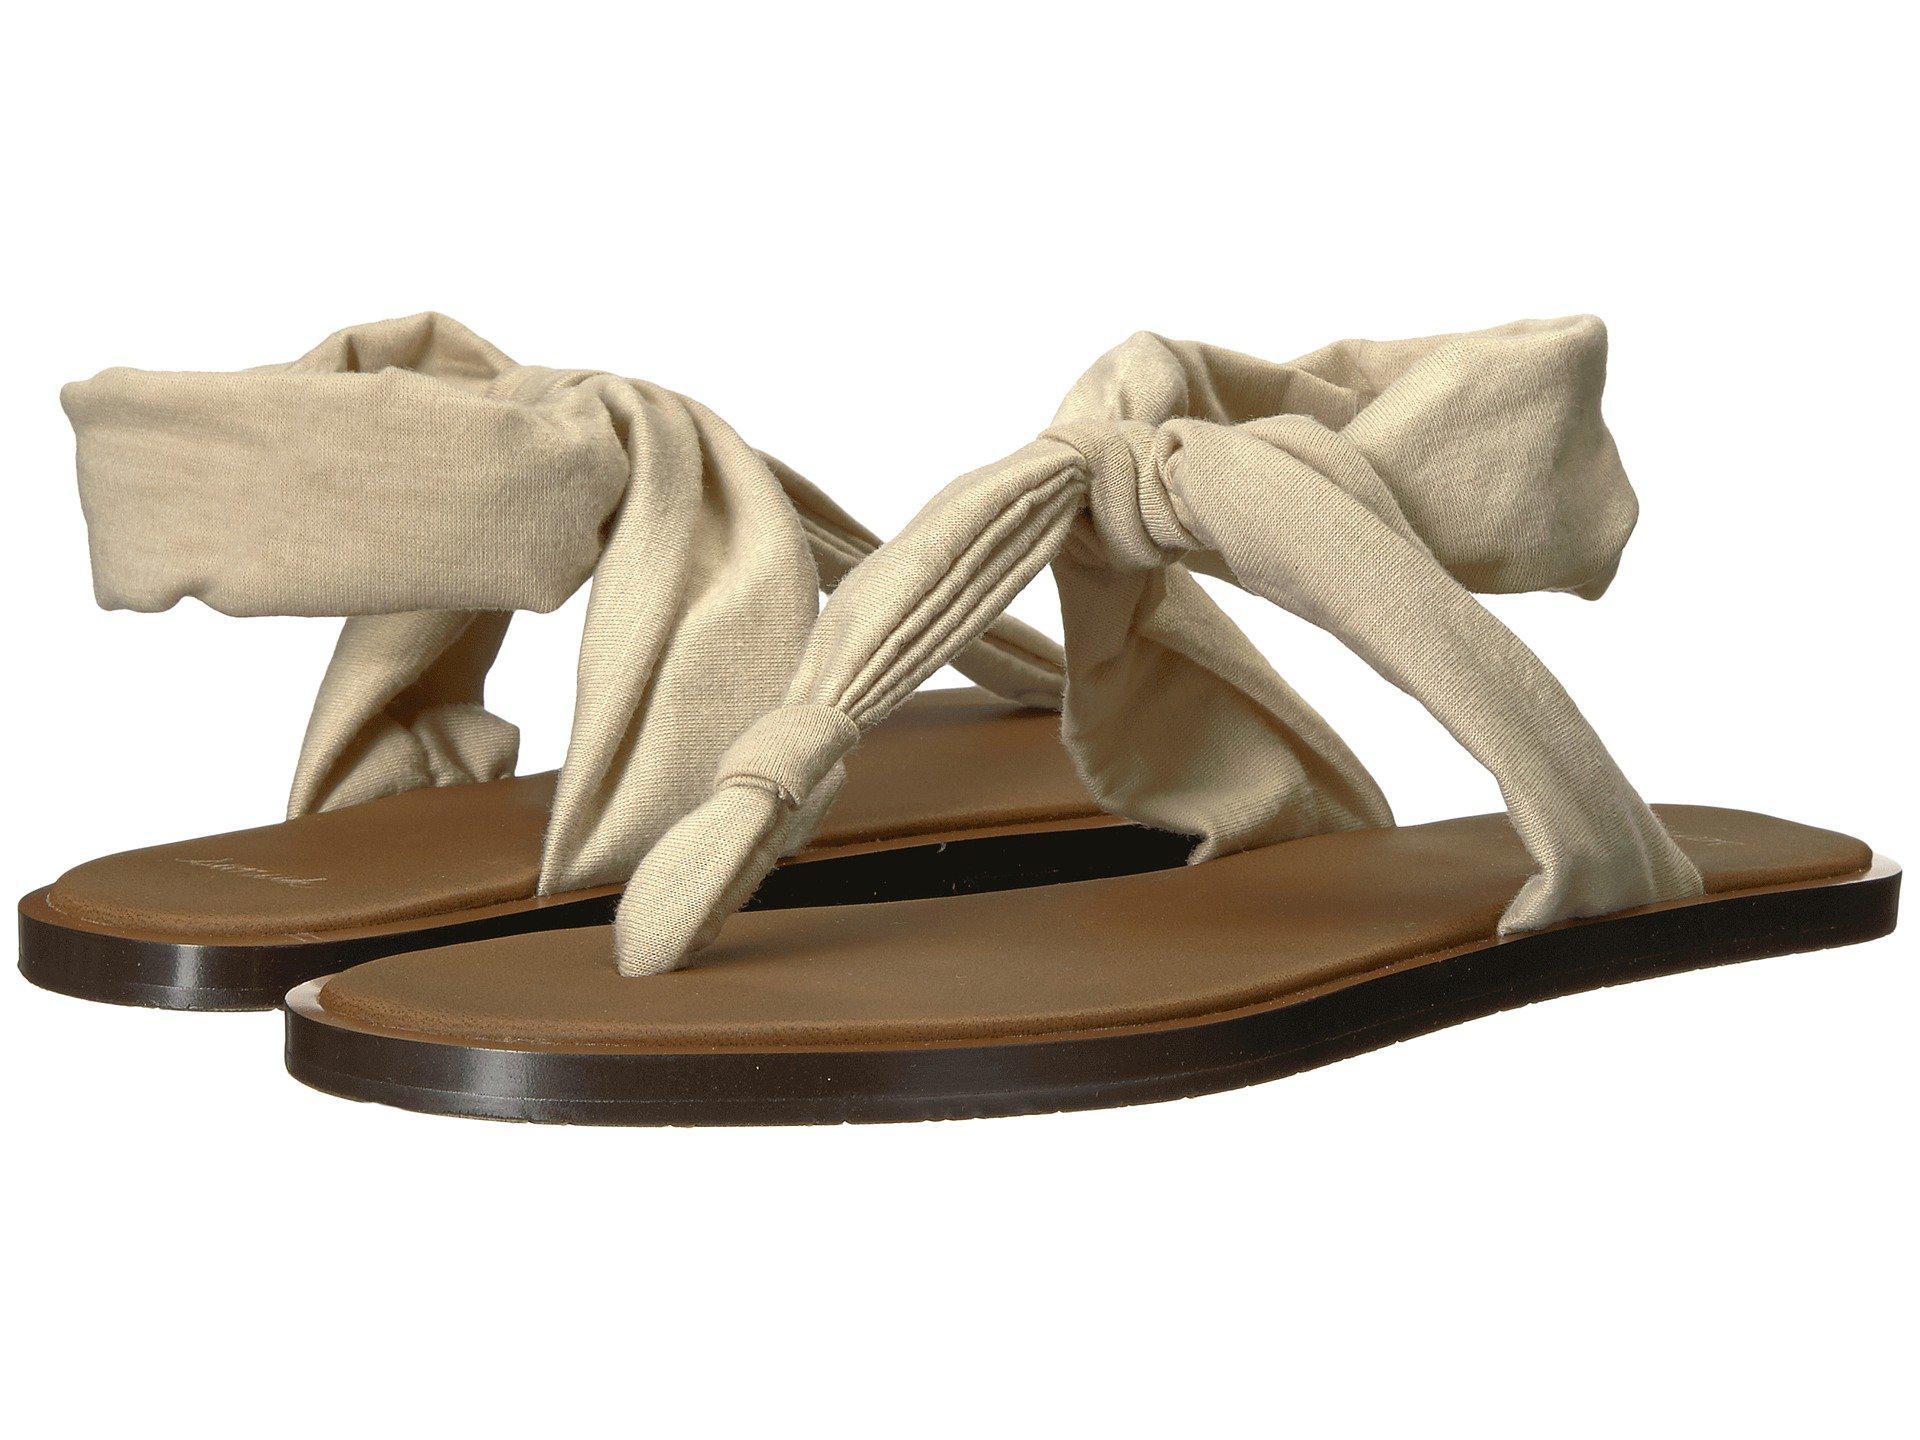 e243c16027e51 Lyst - Sanuk Yoga Sling Ella Lx (natural) Women s Sandals in Natural